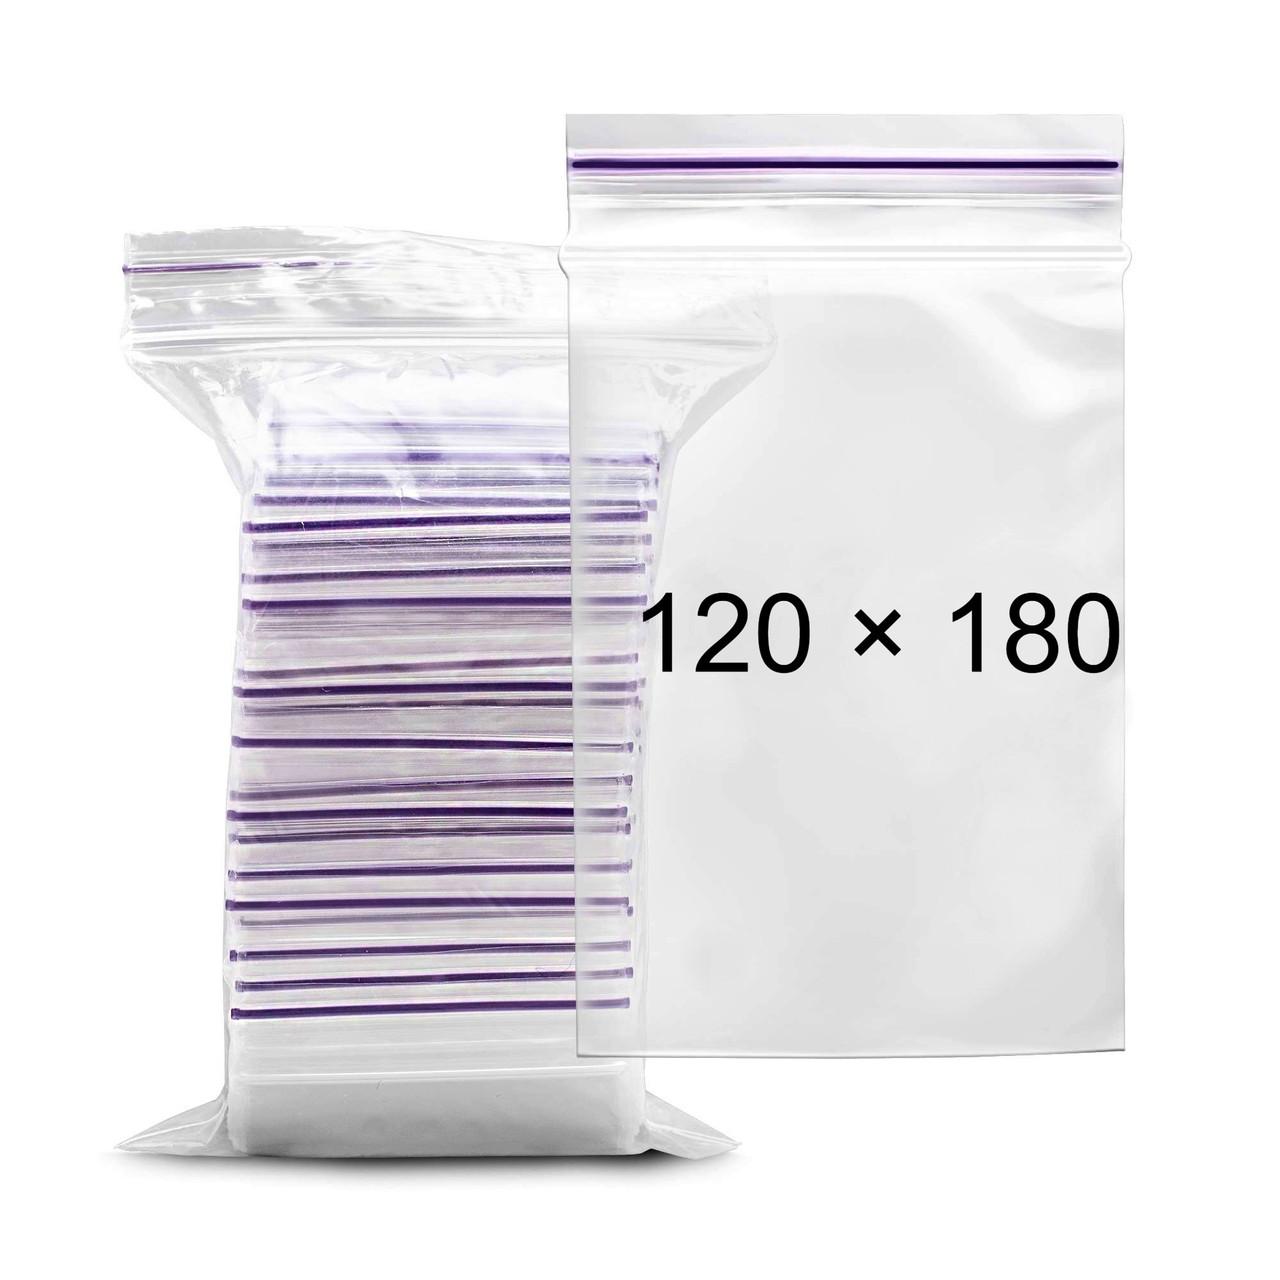 Пакеты с замком Zip-Lock - 120 × 180